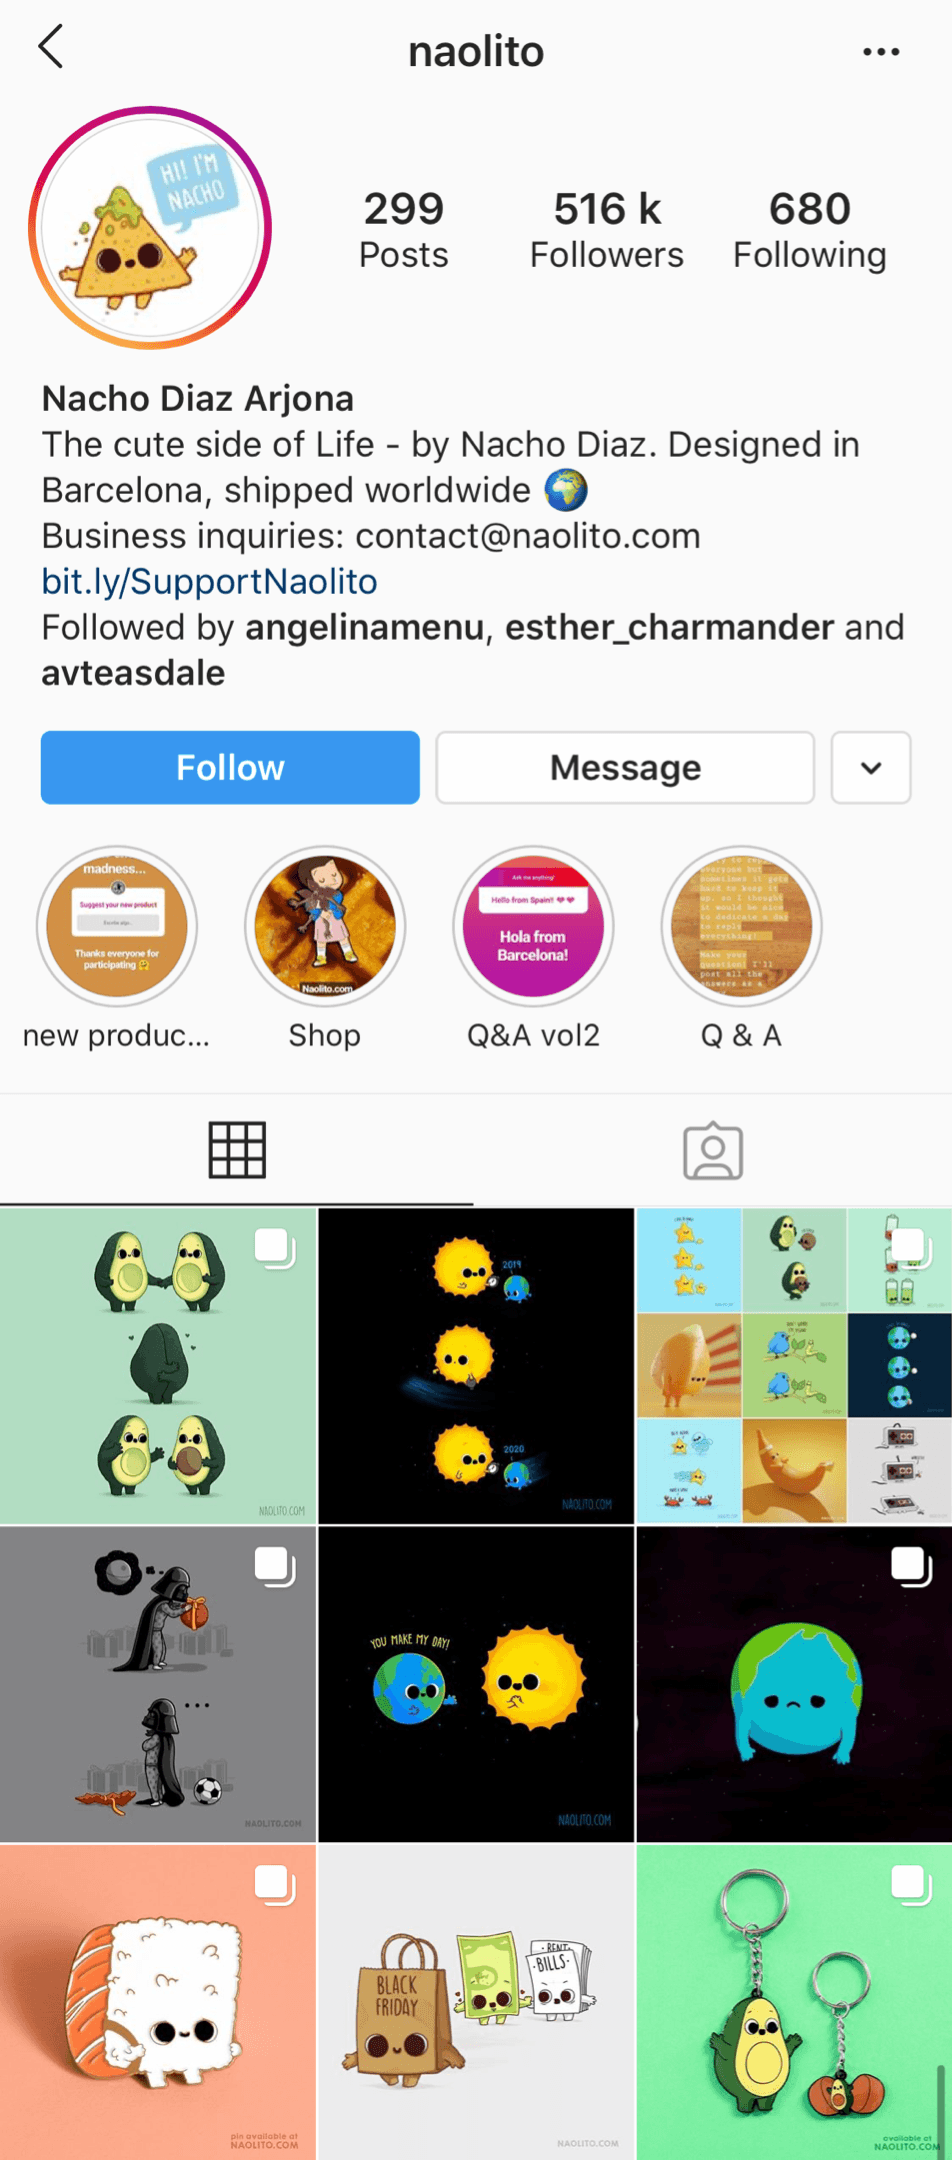 @naolito Instagram profile